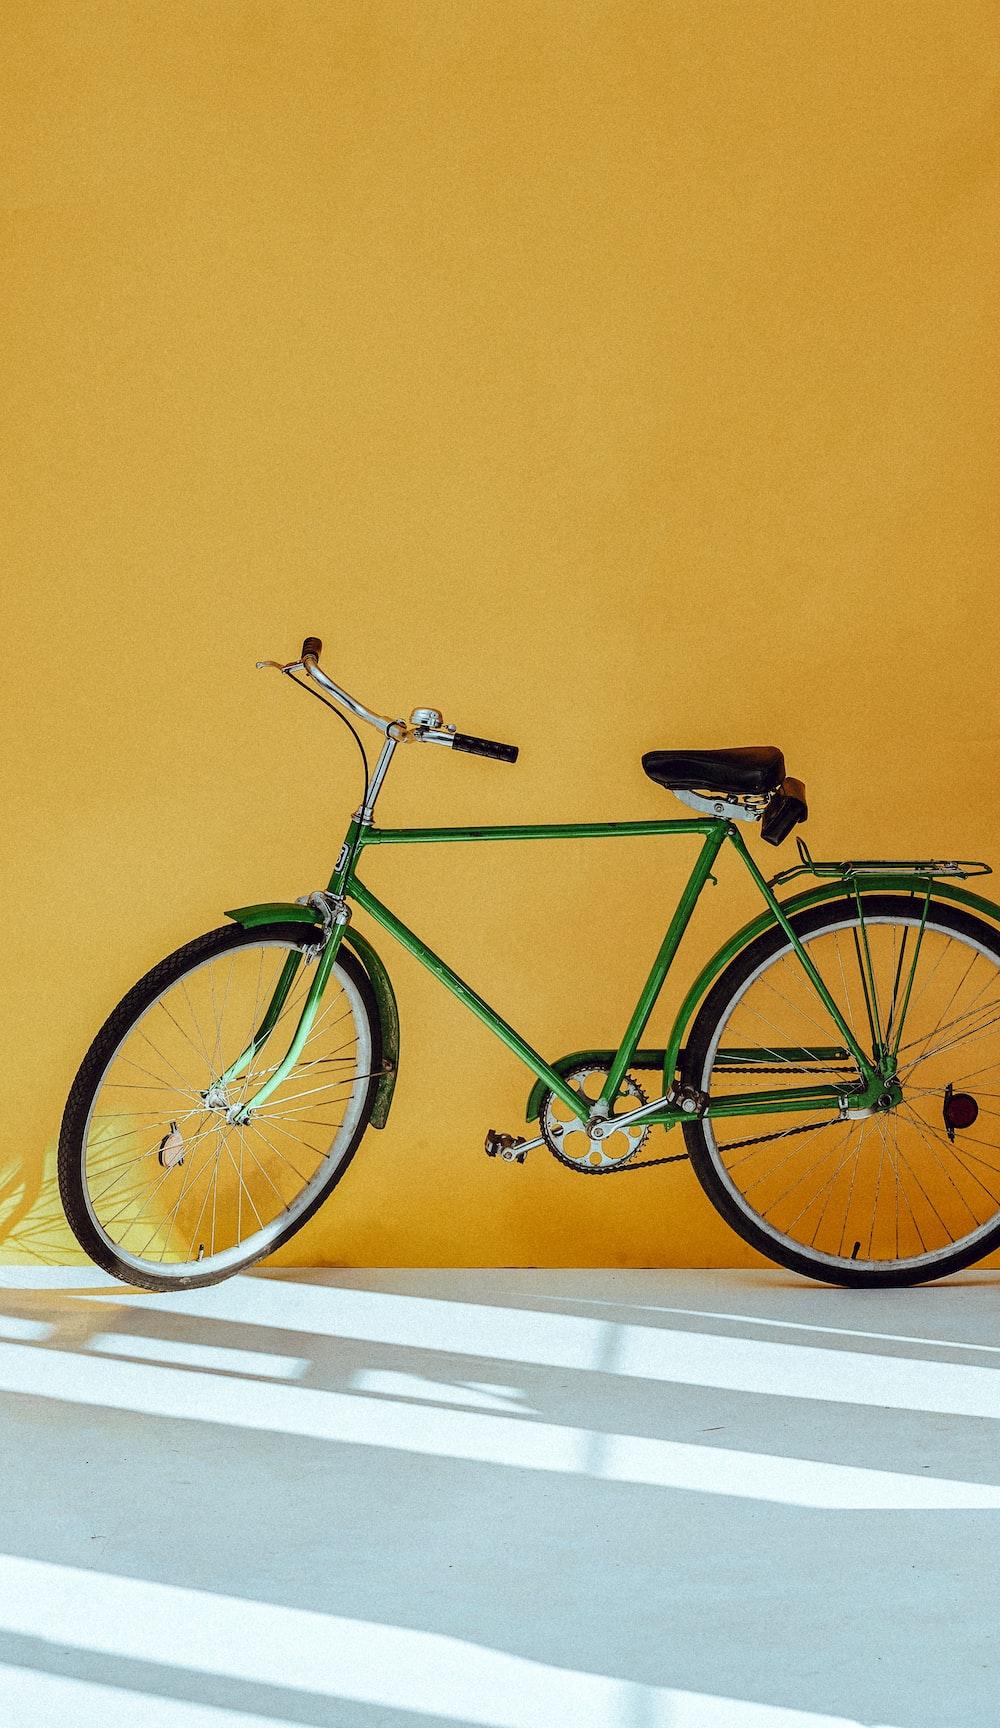 parked green bike